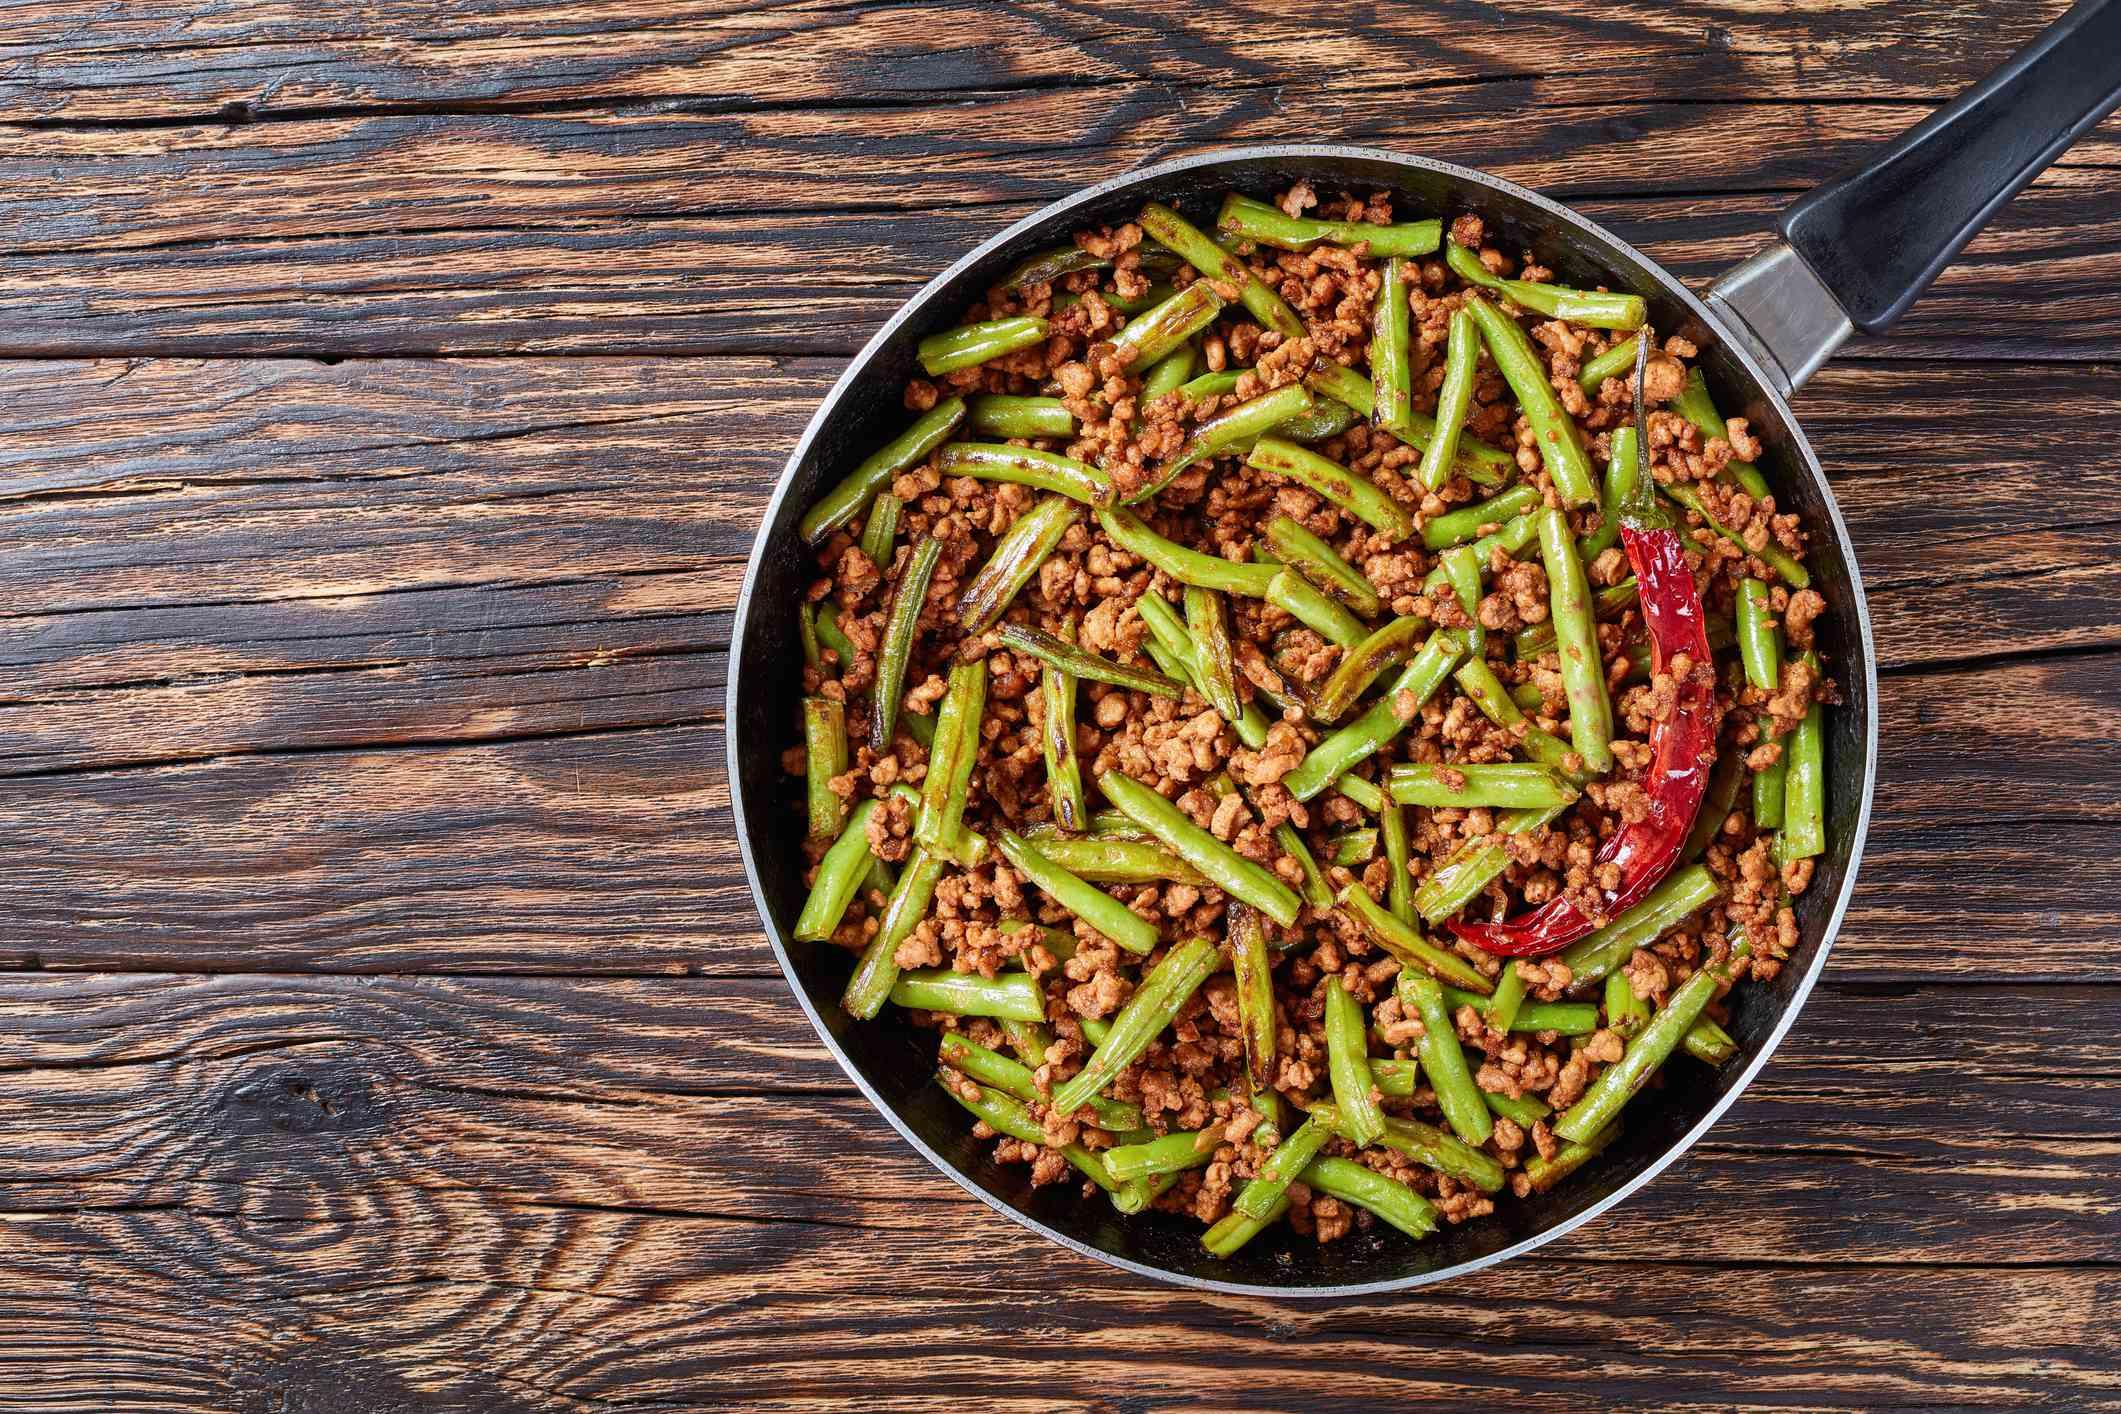 Szechuan Stir Fried Green Beans with ground pork in a skillet